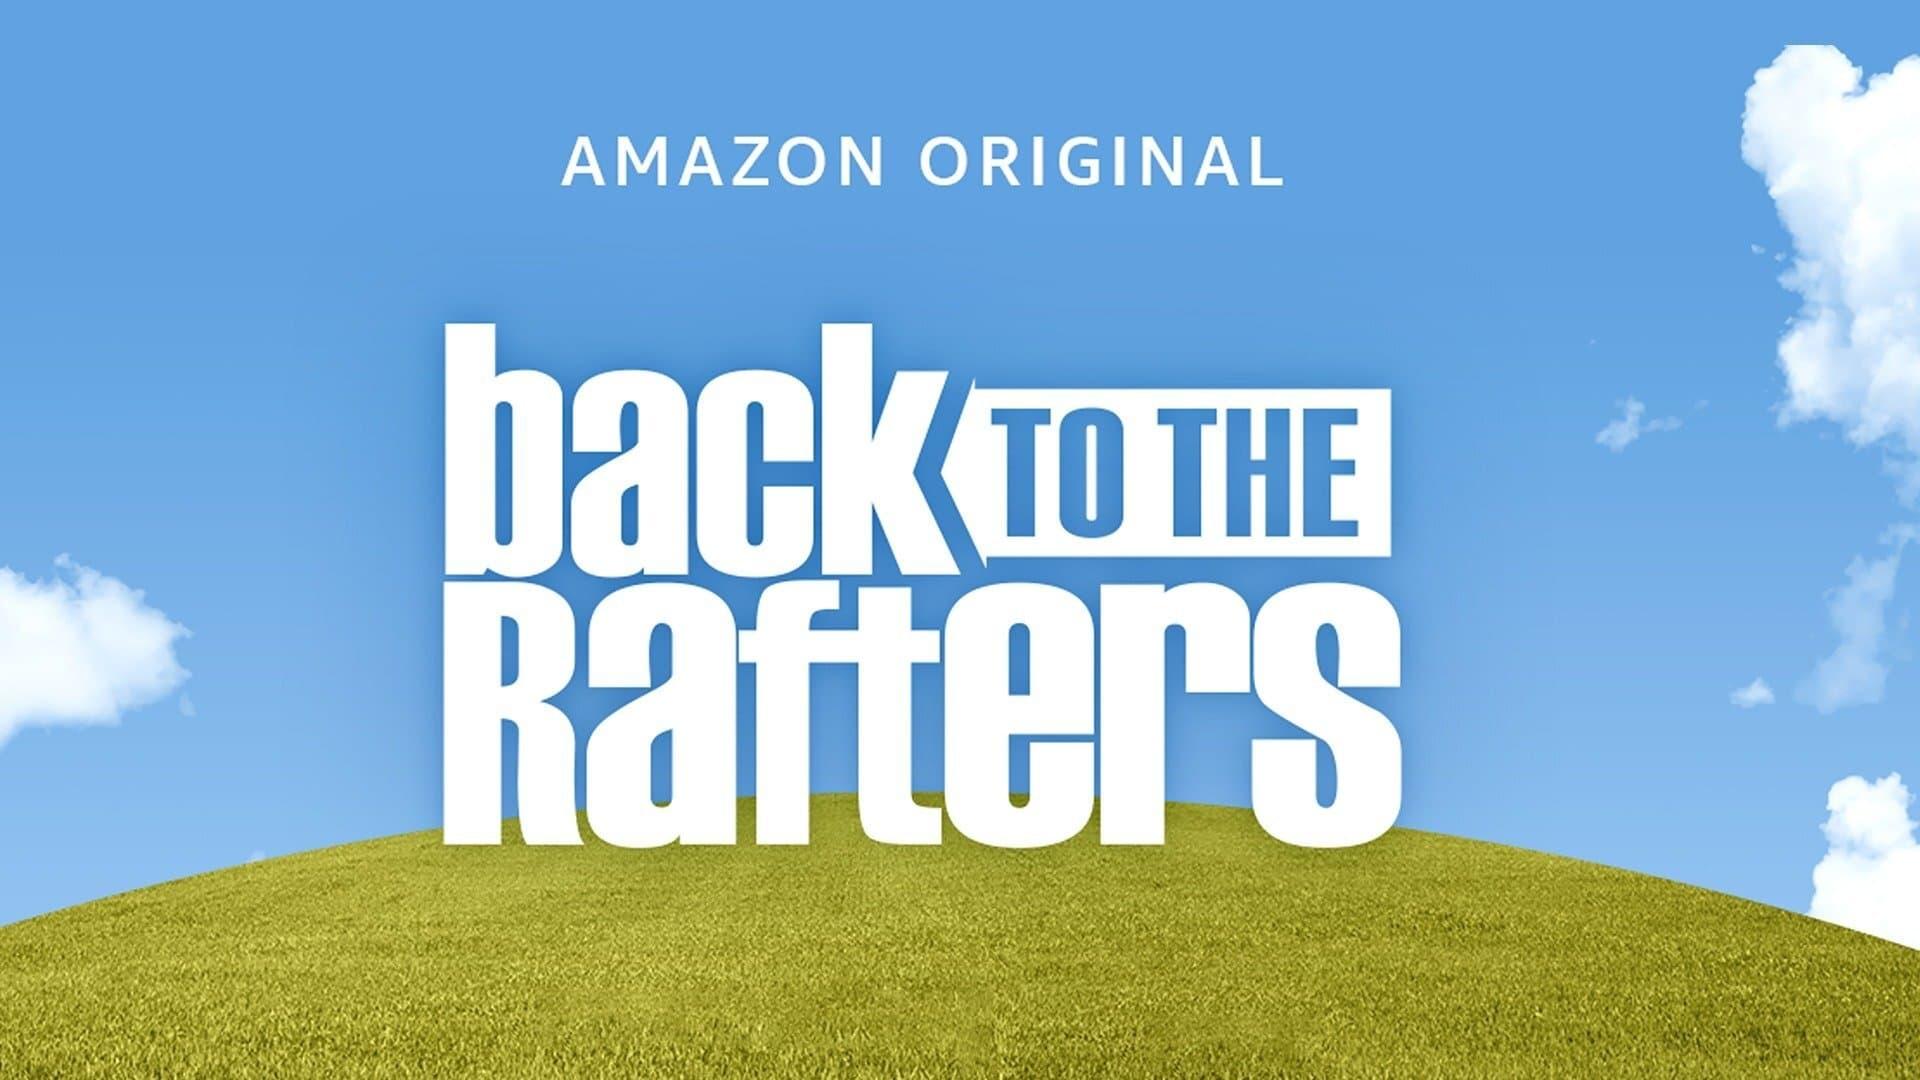 回到椽子上 Back to the Rafters (2021) 中文字幕